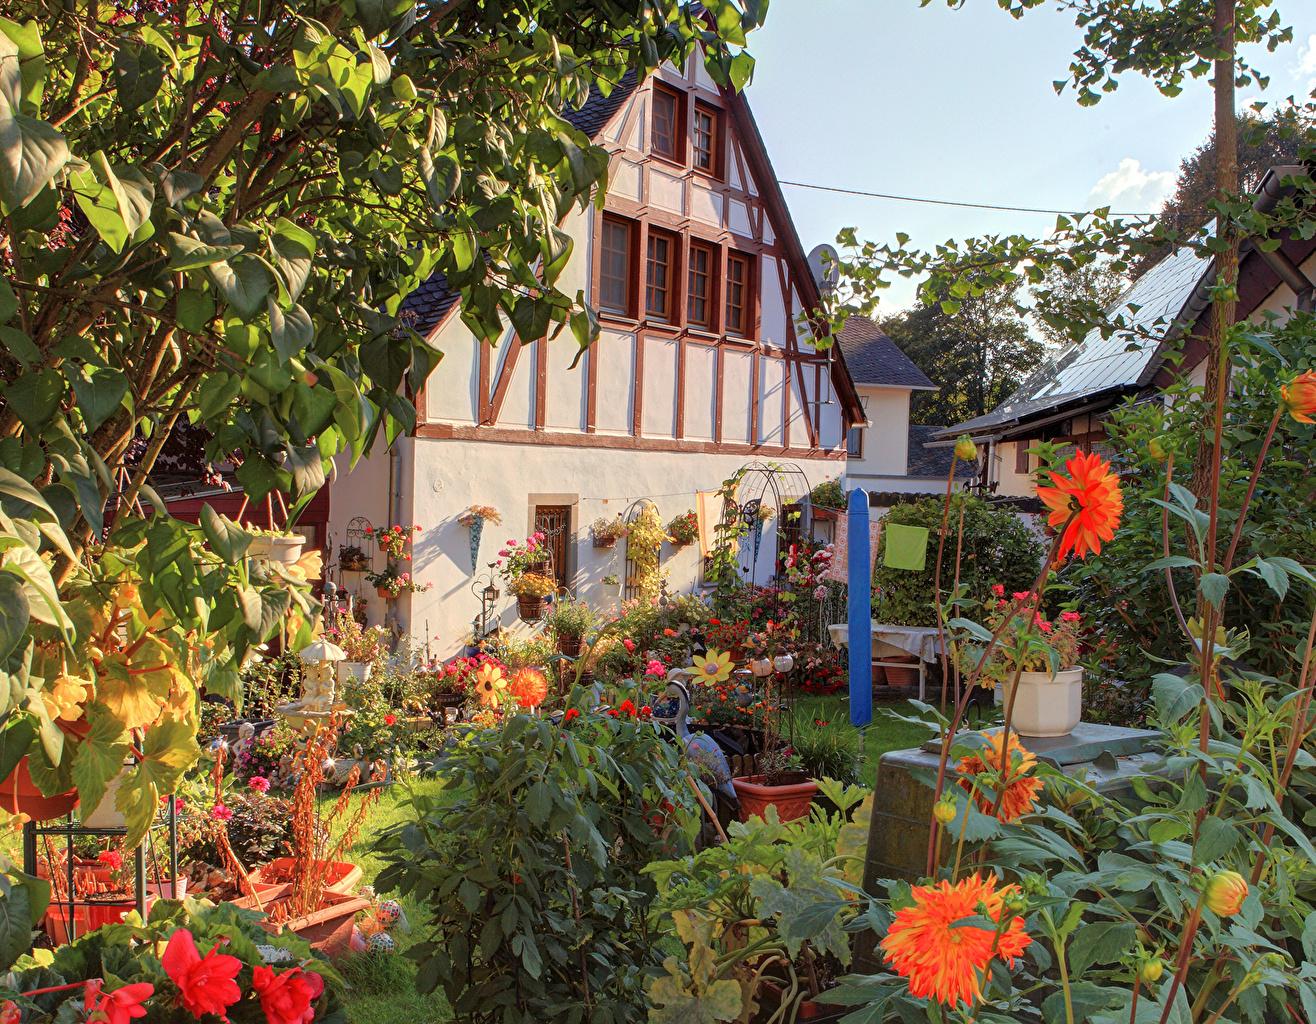 Desktop Wallpapers Germany Landkern Gardens Dahlias Cities Building Houses